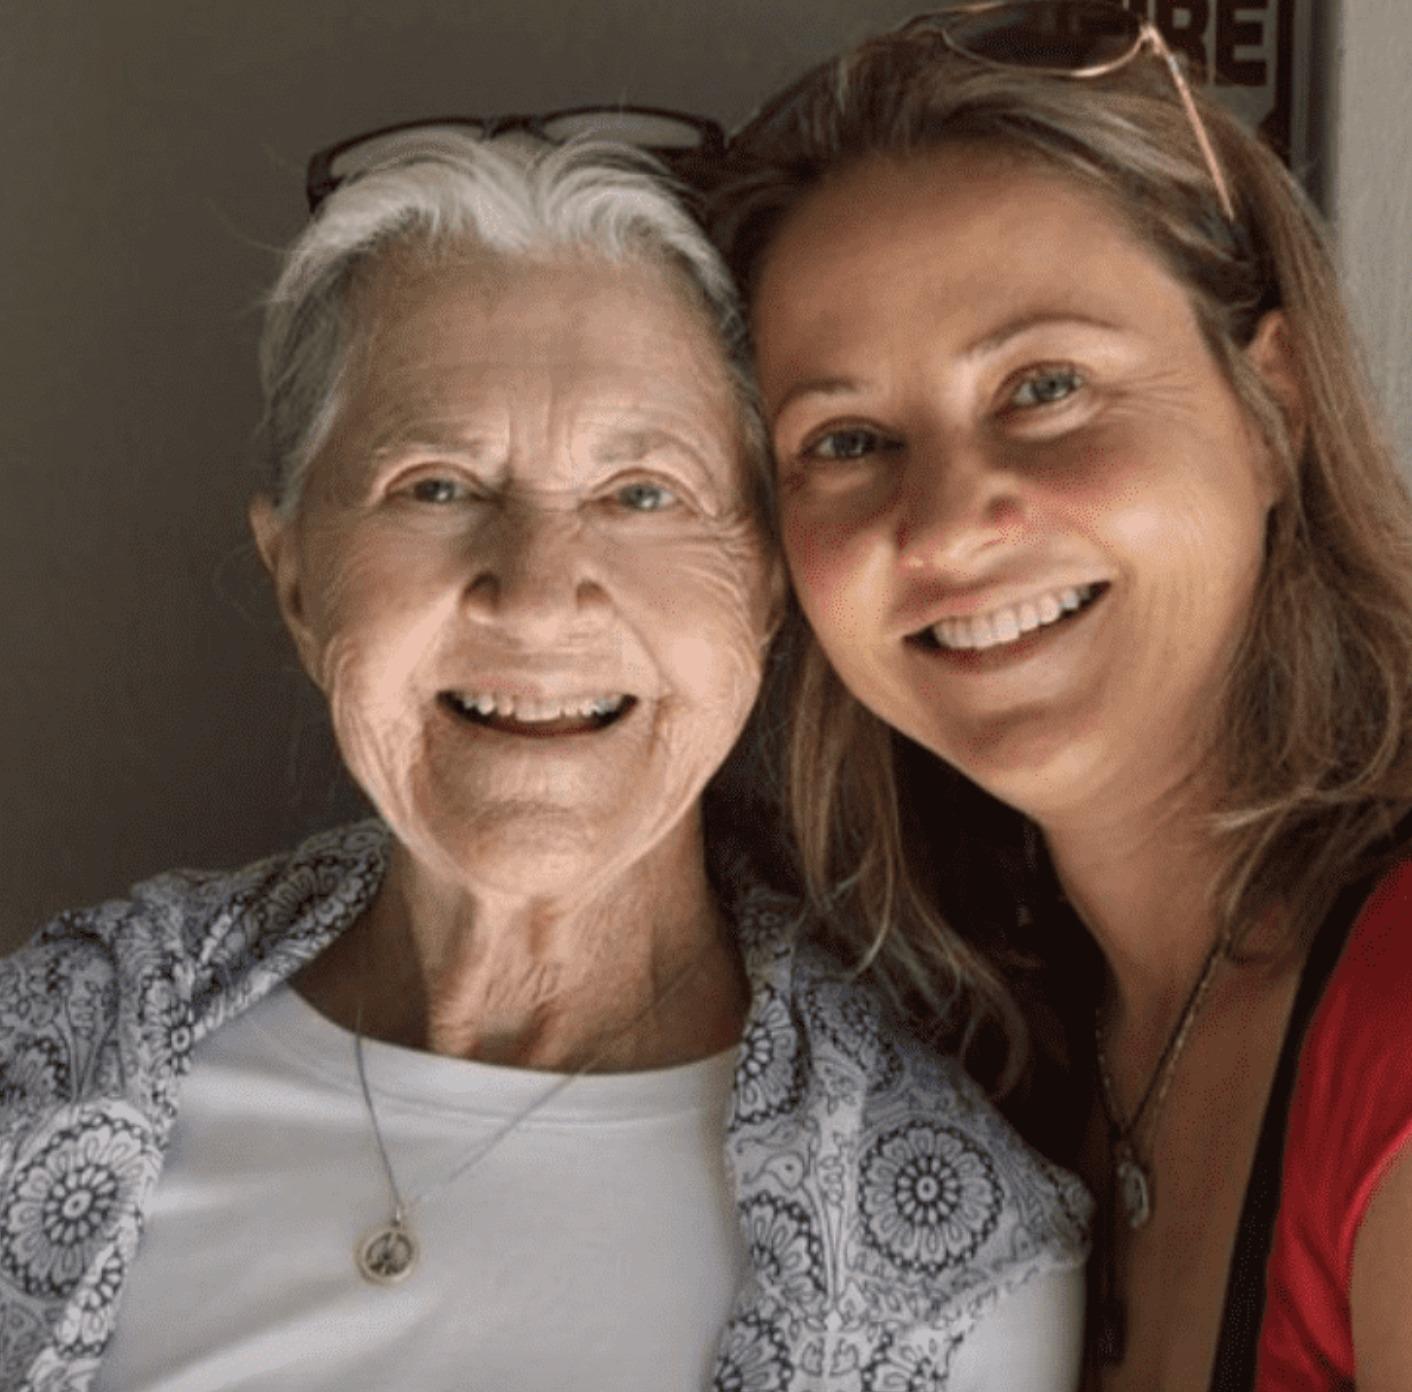 Joanne Linville morta attrice star trek